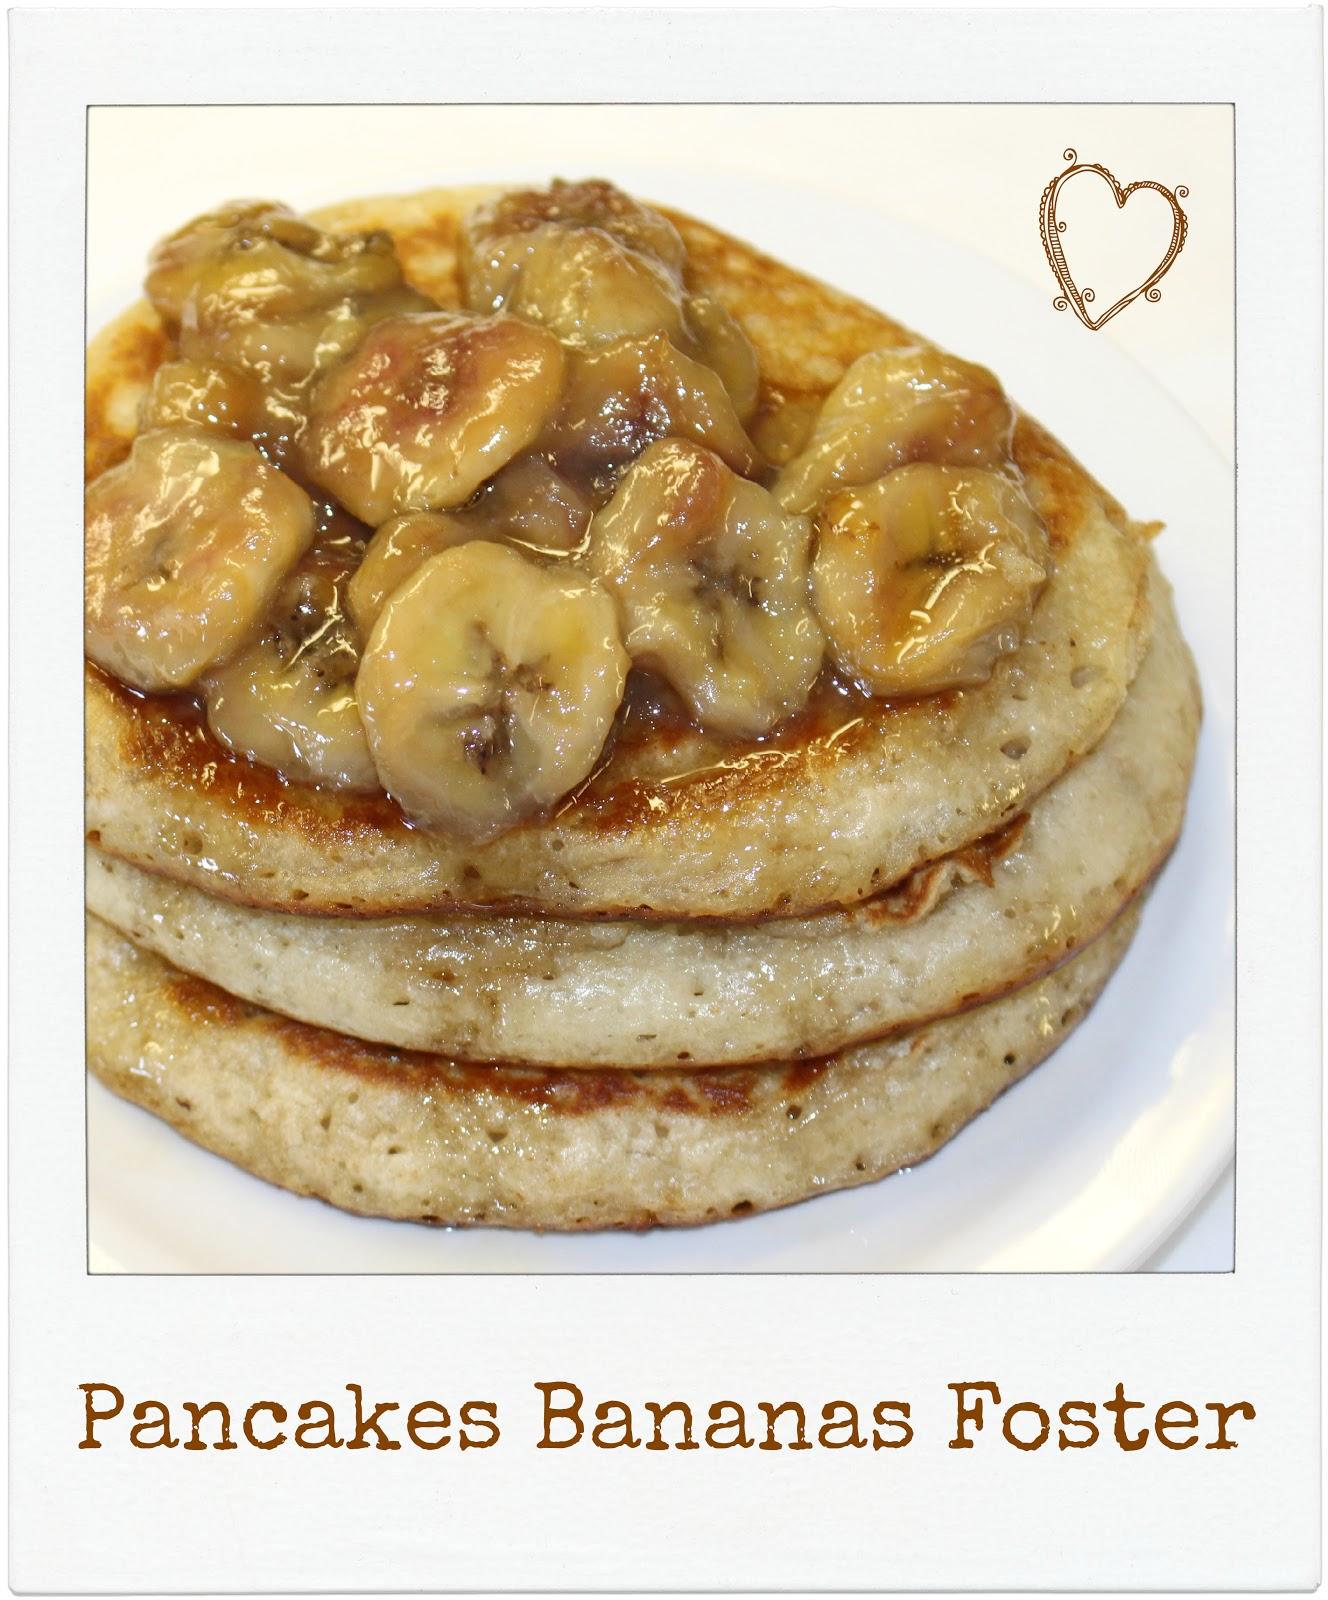 Buttermilk Bananas Foster Pancakes